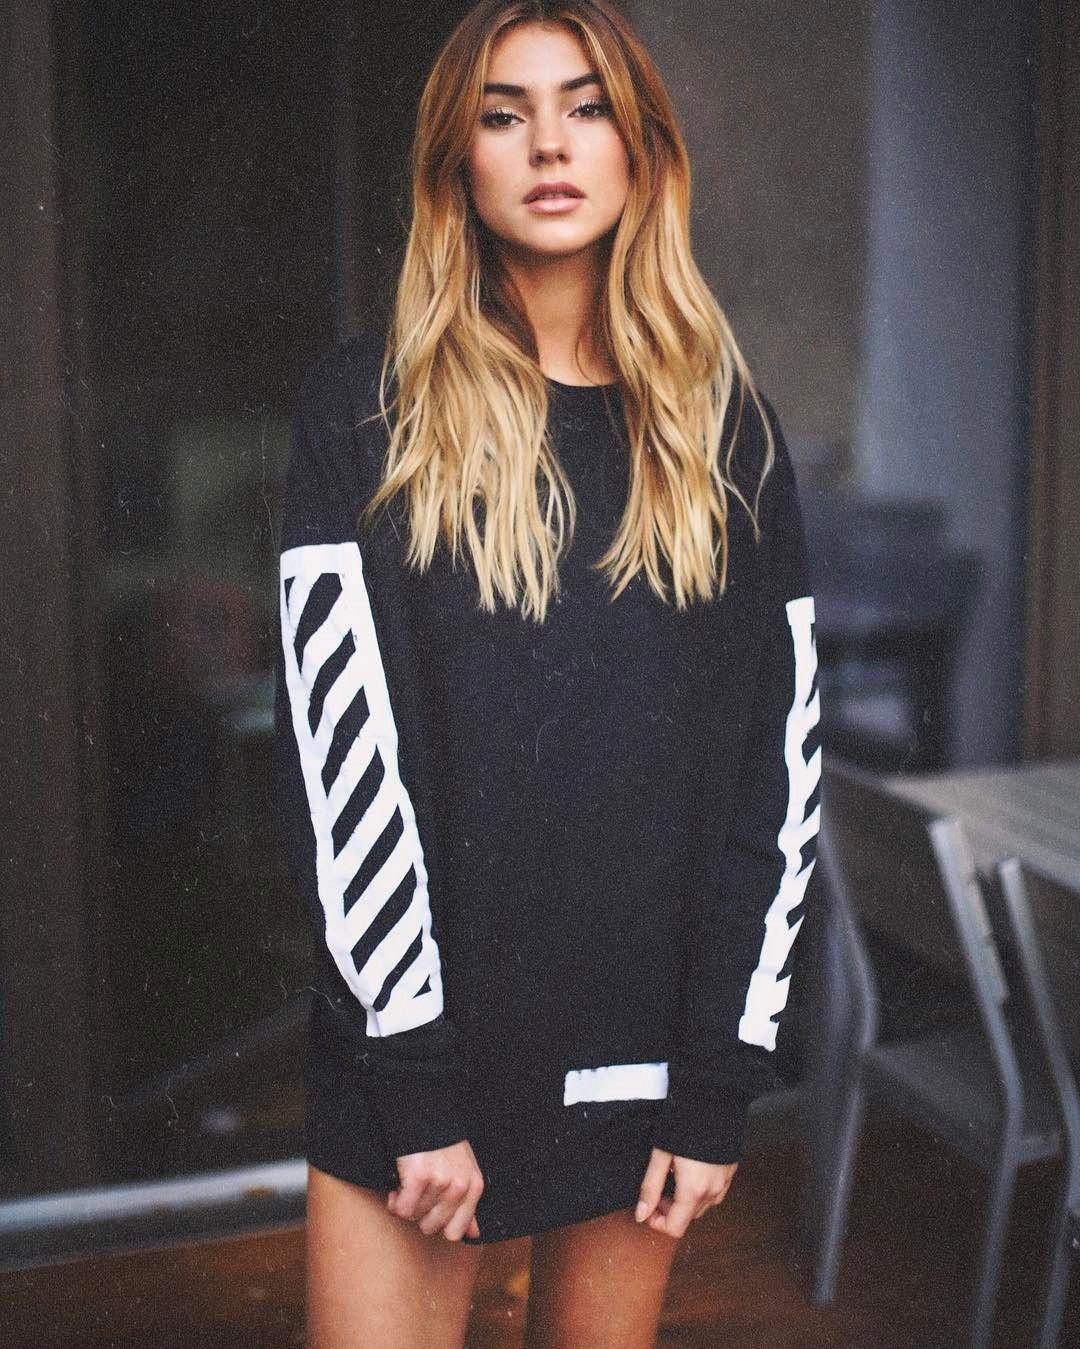 Stefanie Giesinger | Stefanie Giesinger in 2019 | Fashion ...